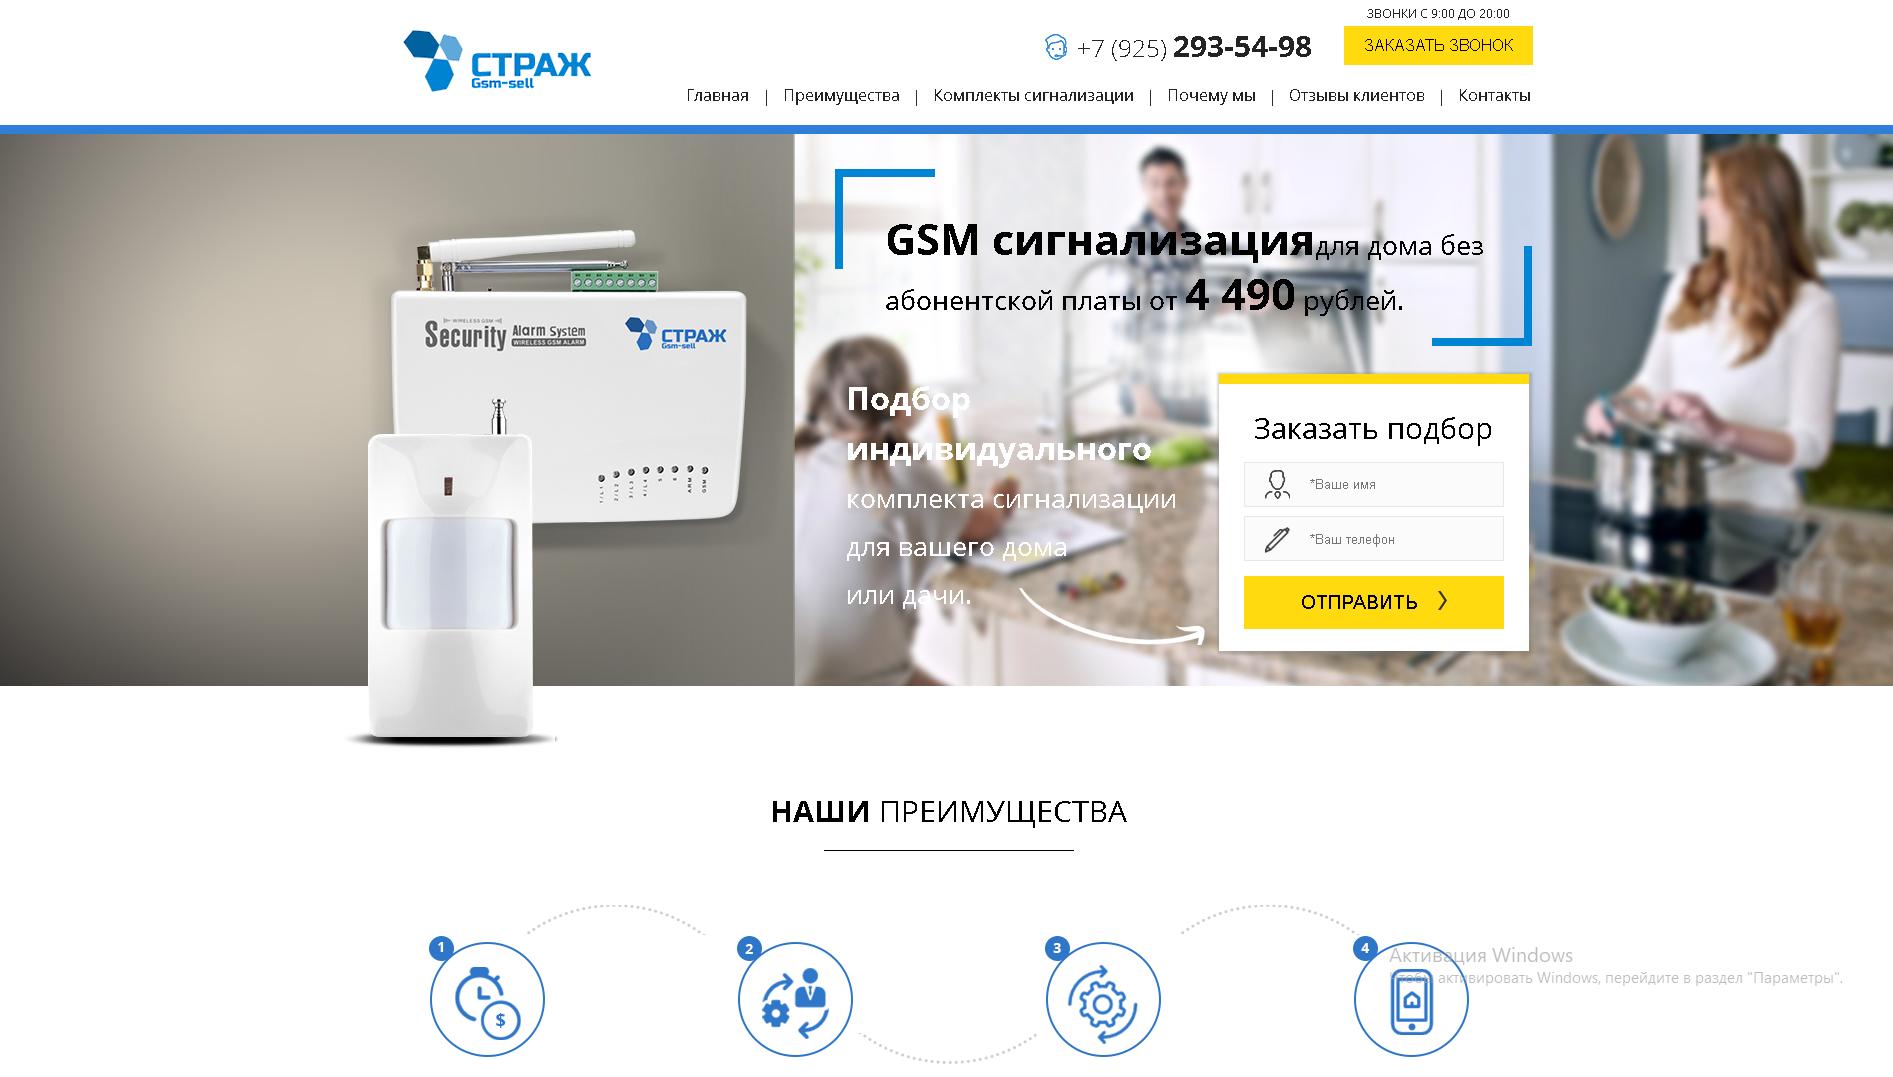 GSM сигнализация для дома. Директ и Адвордс